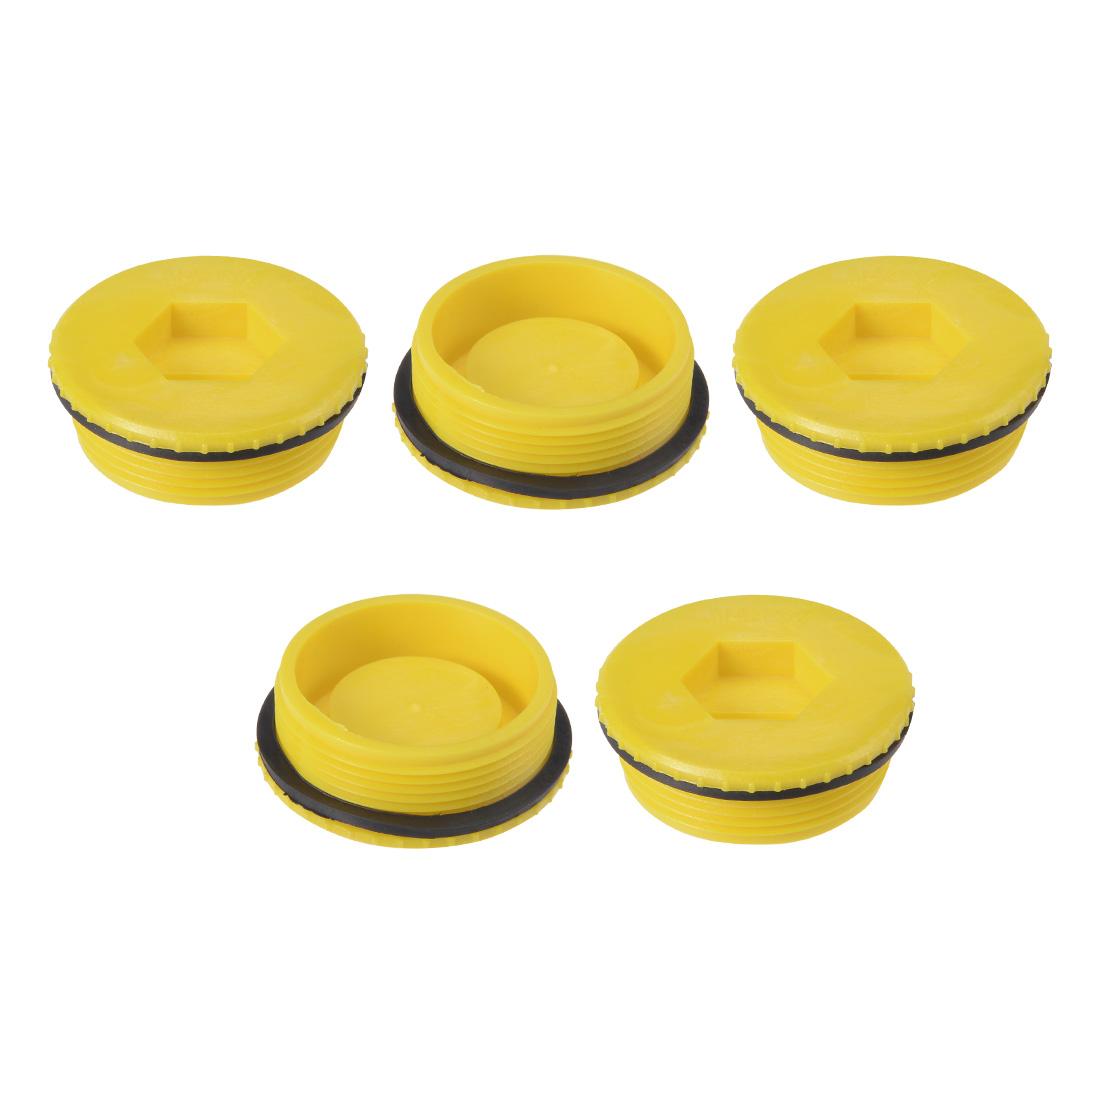 MLD-M48 M48 Hex Socket Design PE Plastic Male Threaded Sealing Cap Yellow 5pcs